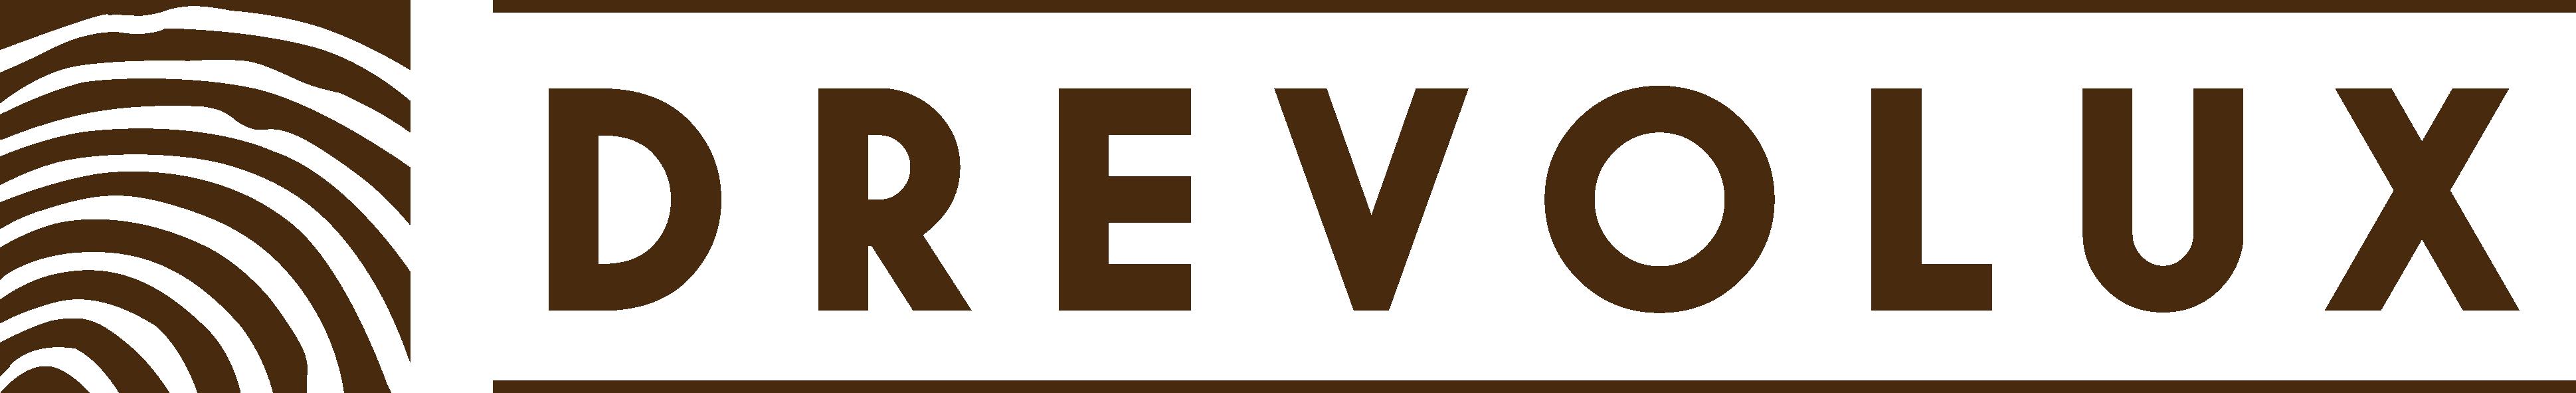 Drevolux